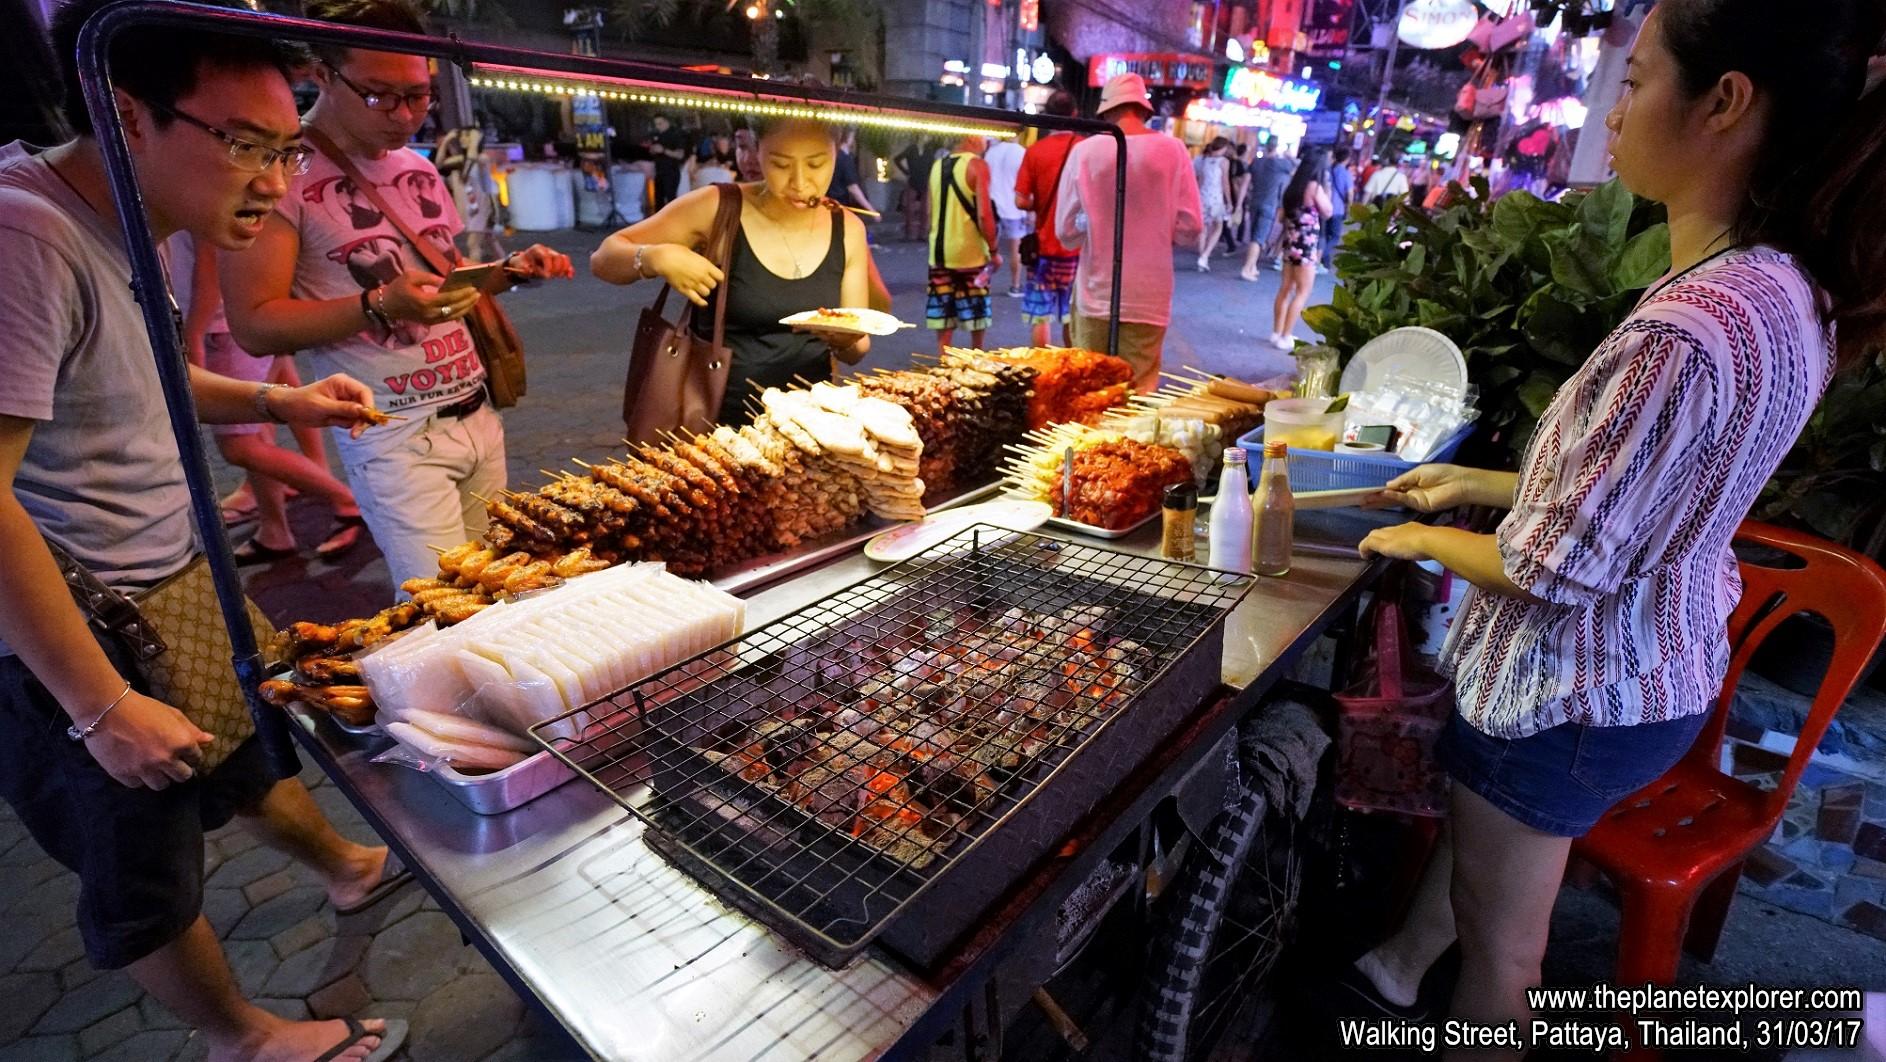 2017-03-31_1956_Thailand_Pattaya_Walking Street_DSC04089_s7R2_LR_@